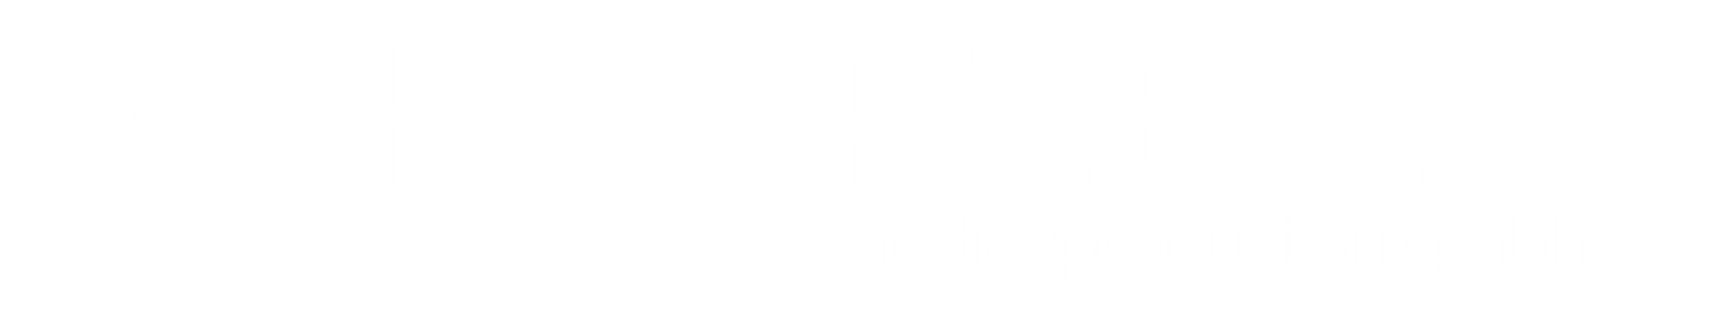 SCHWARZBILD-logo-white - HP.png